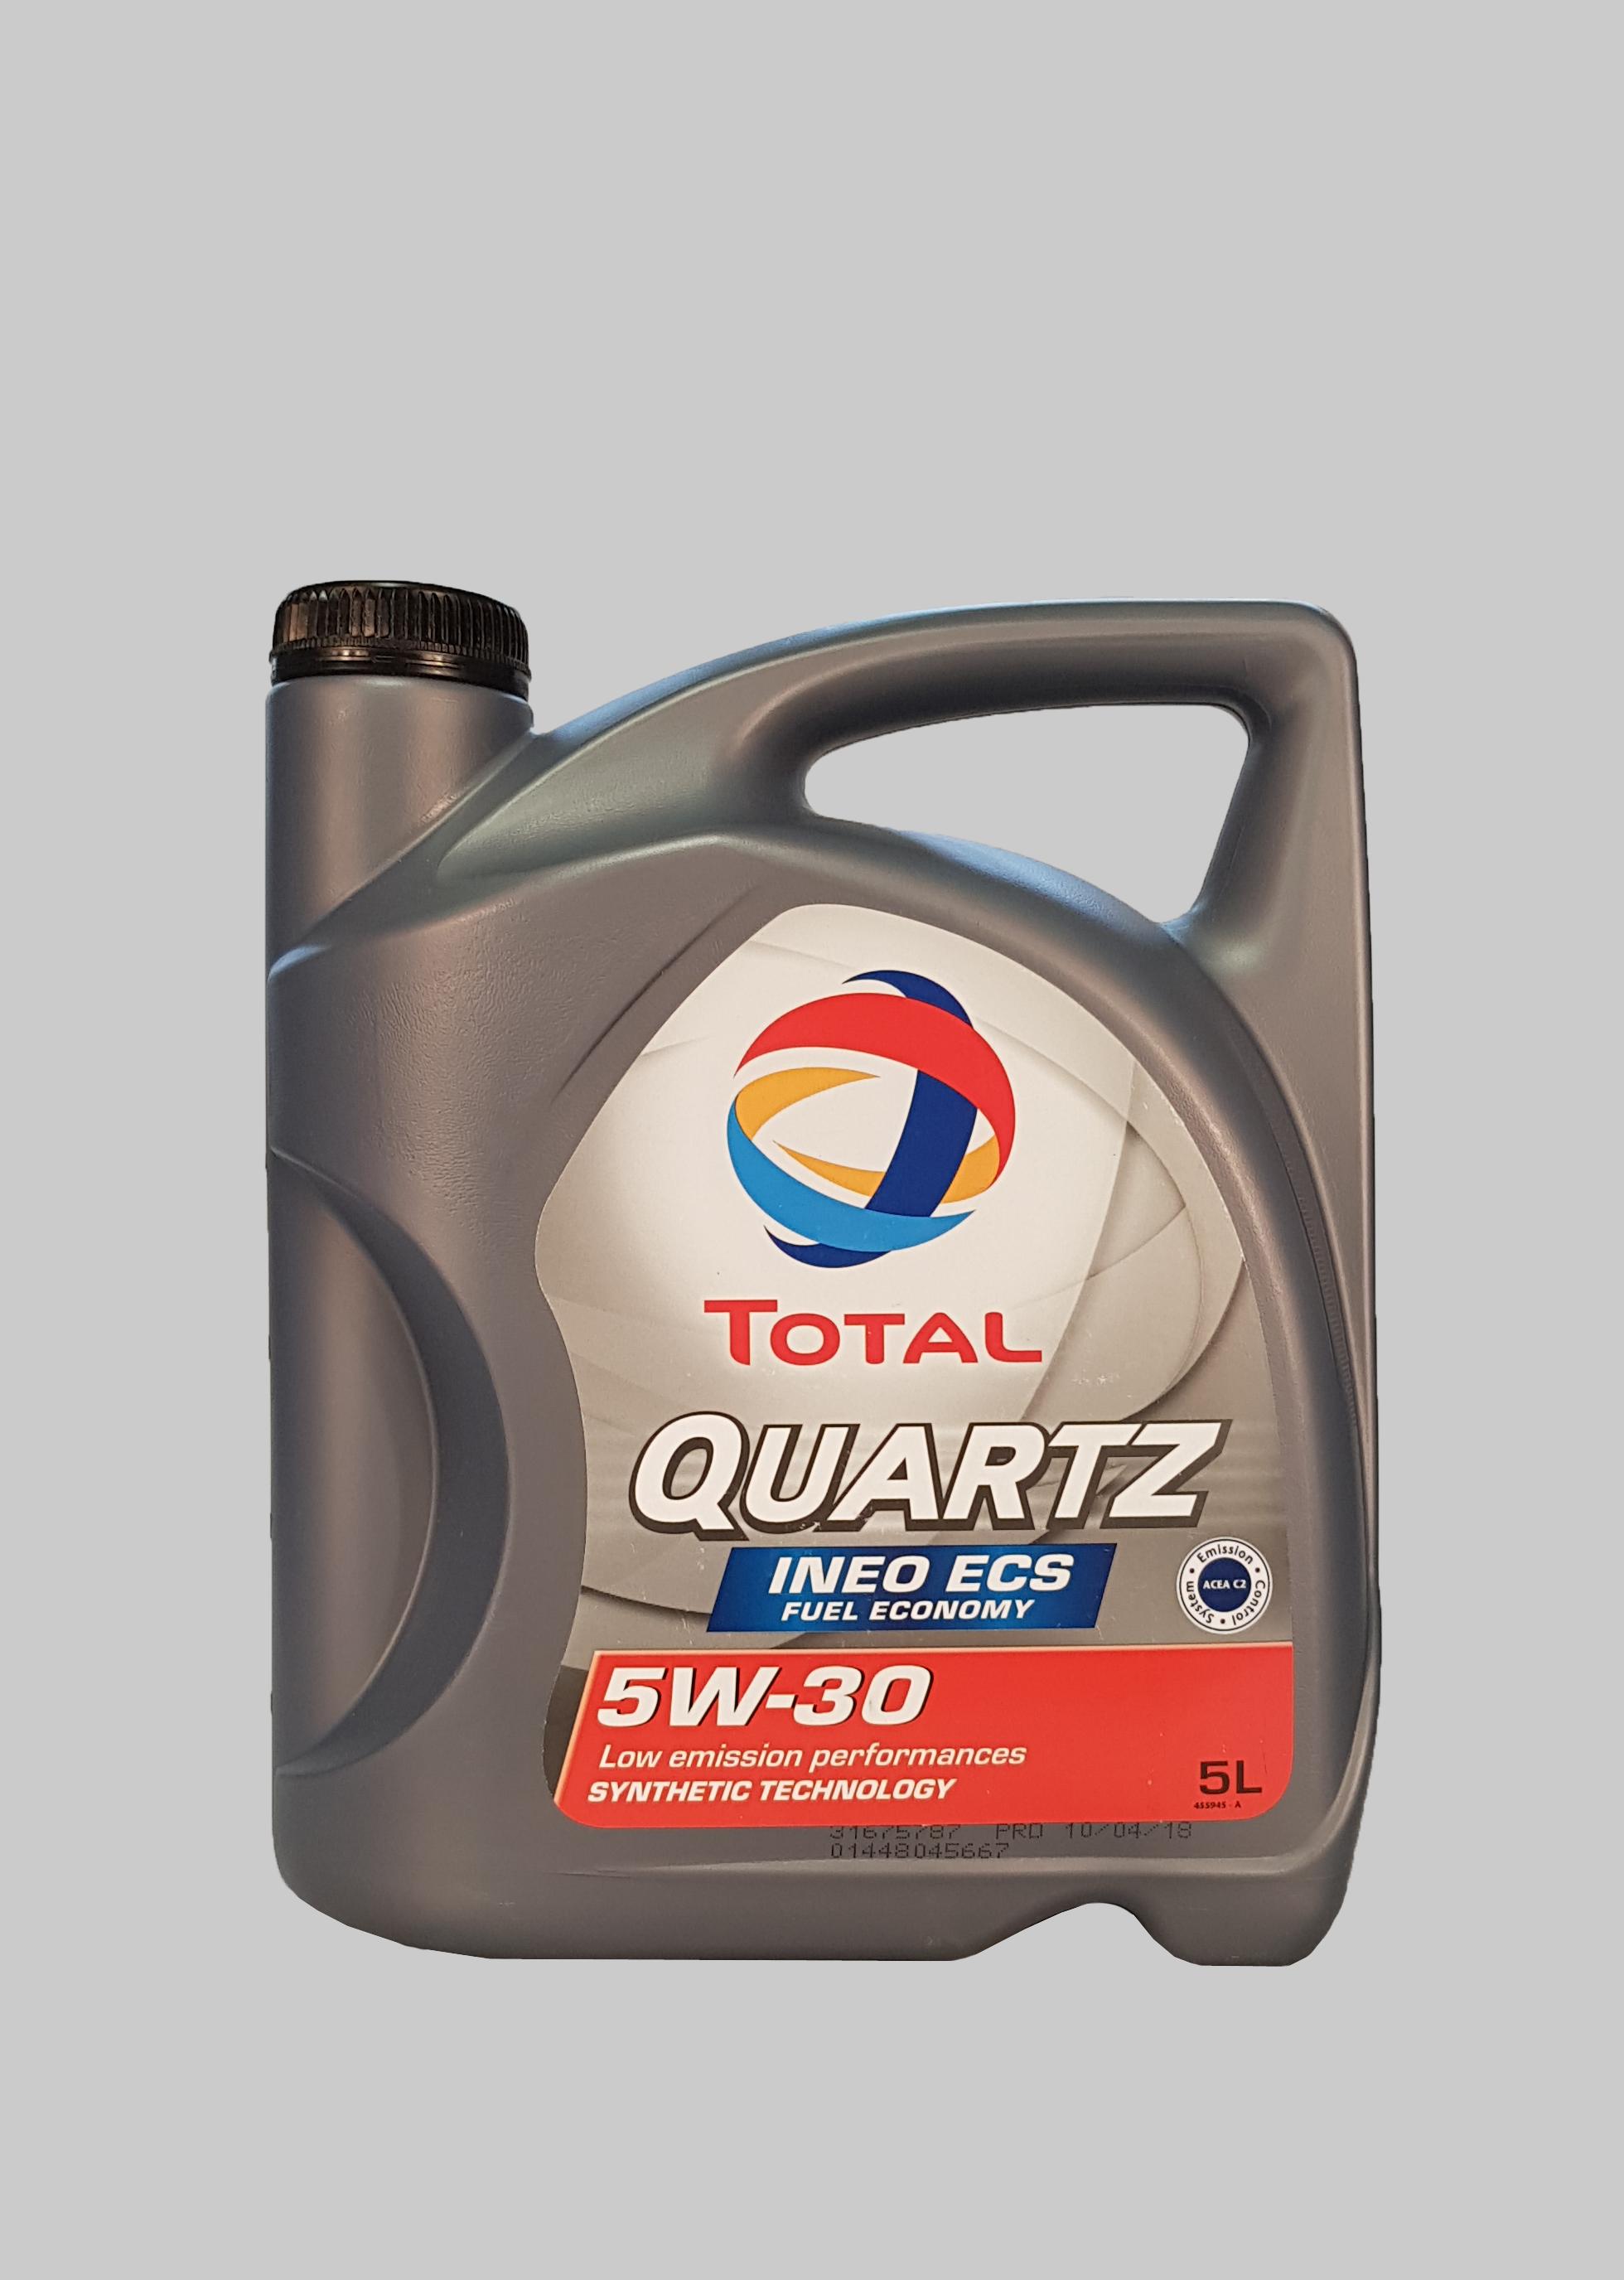 Total Quartz Ineo ECS 5W-30 5 Liter